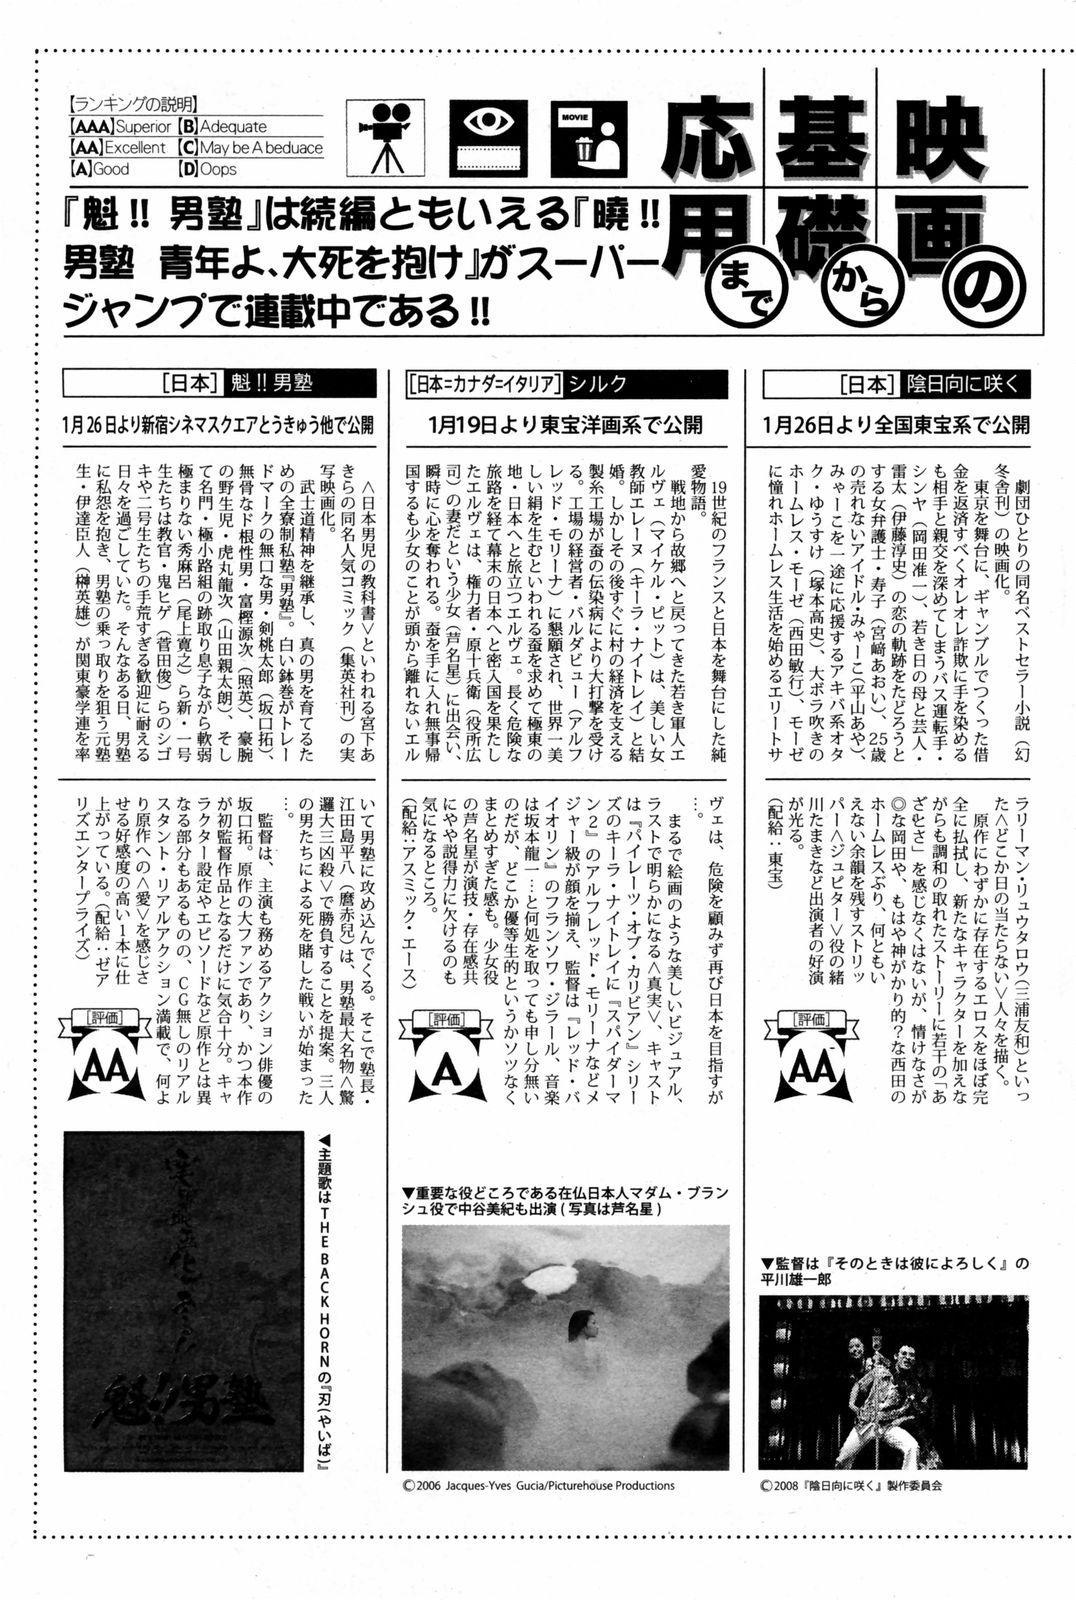 Manga Bangaichi 2008-03 198